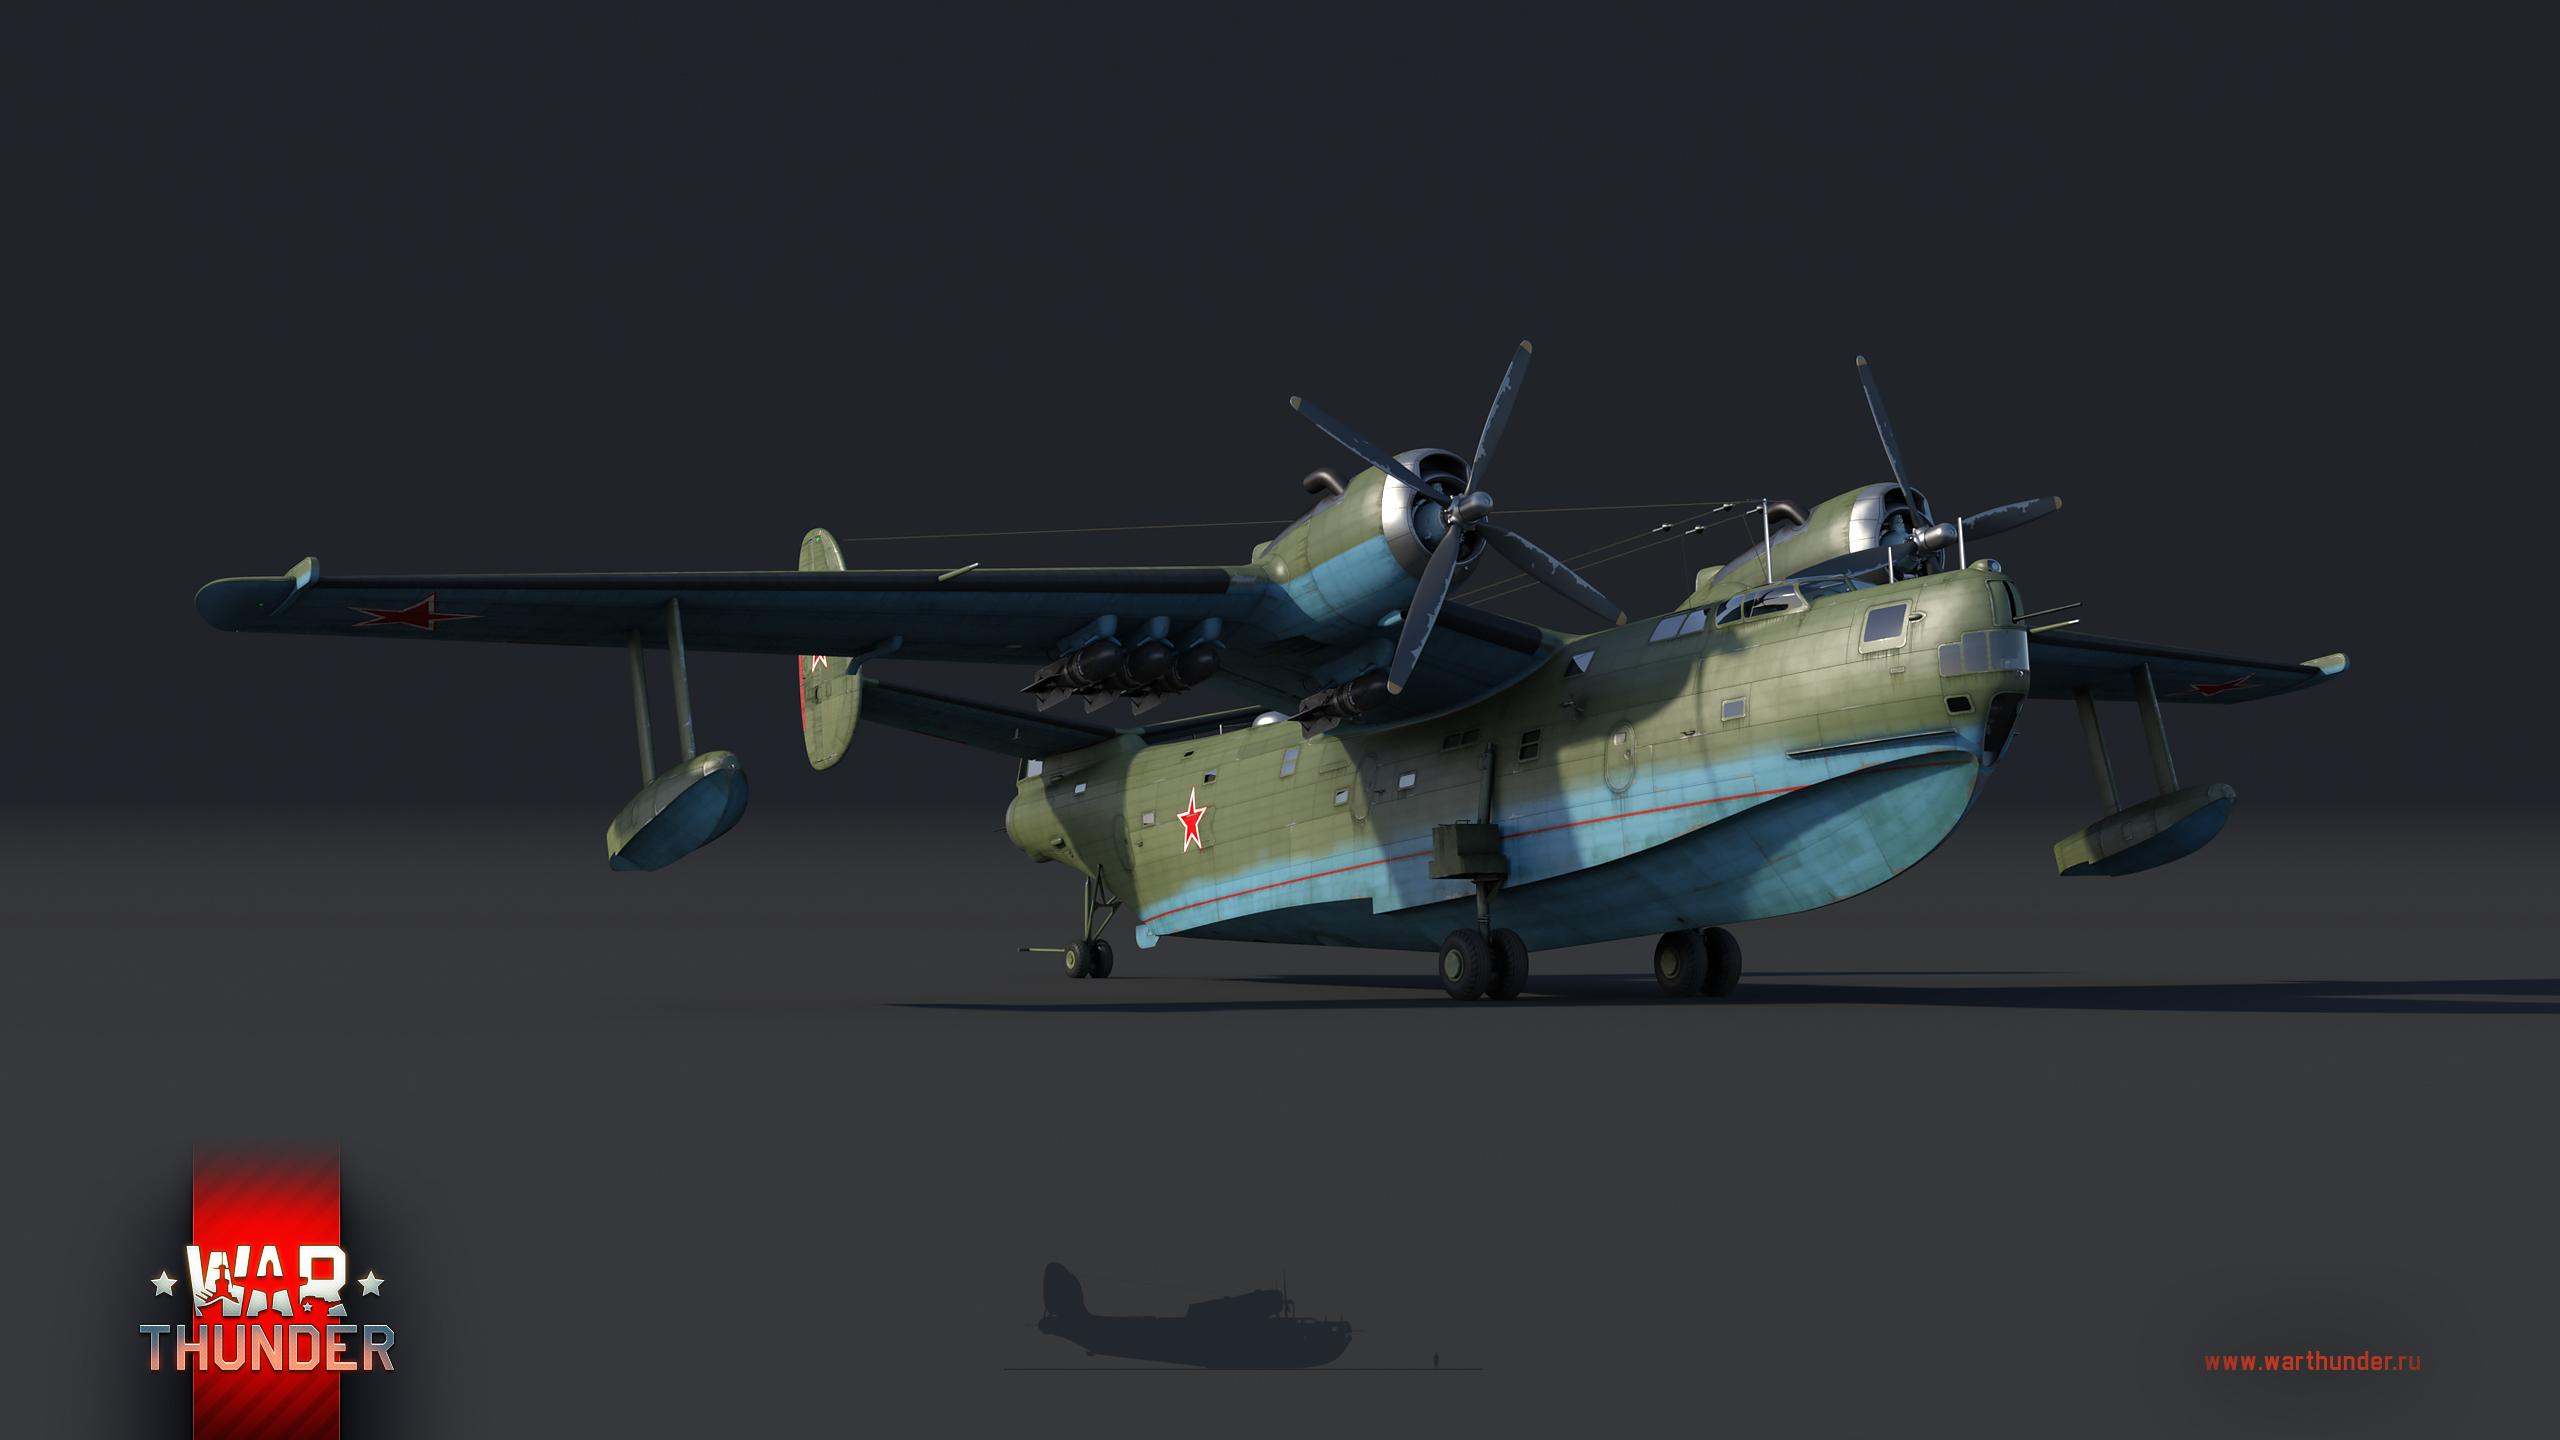 Обои гидросамолёт, вмс, Вода, японские. Авиация foto 19